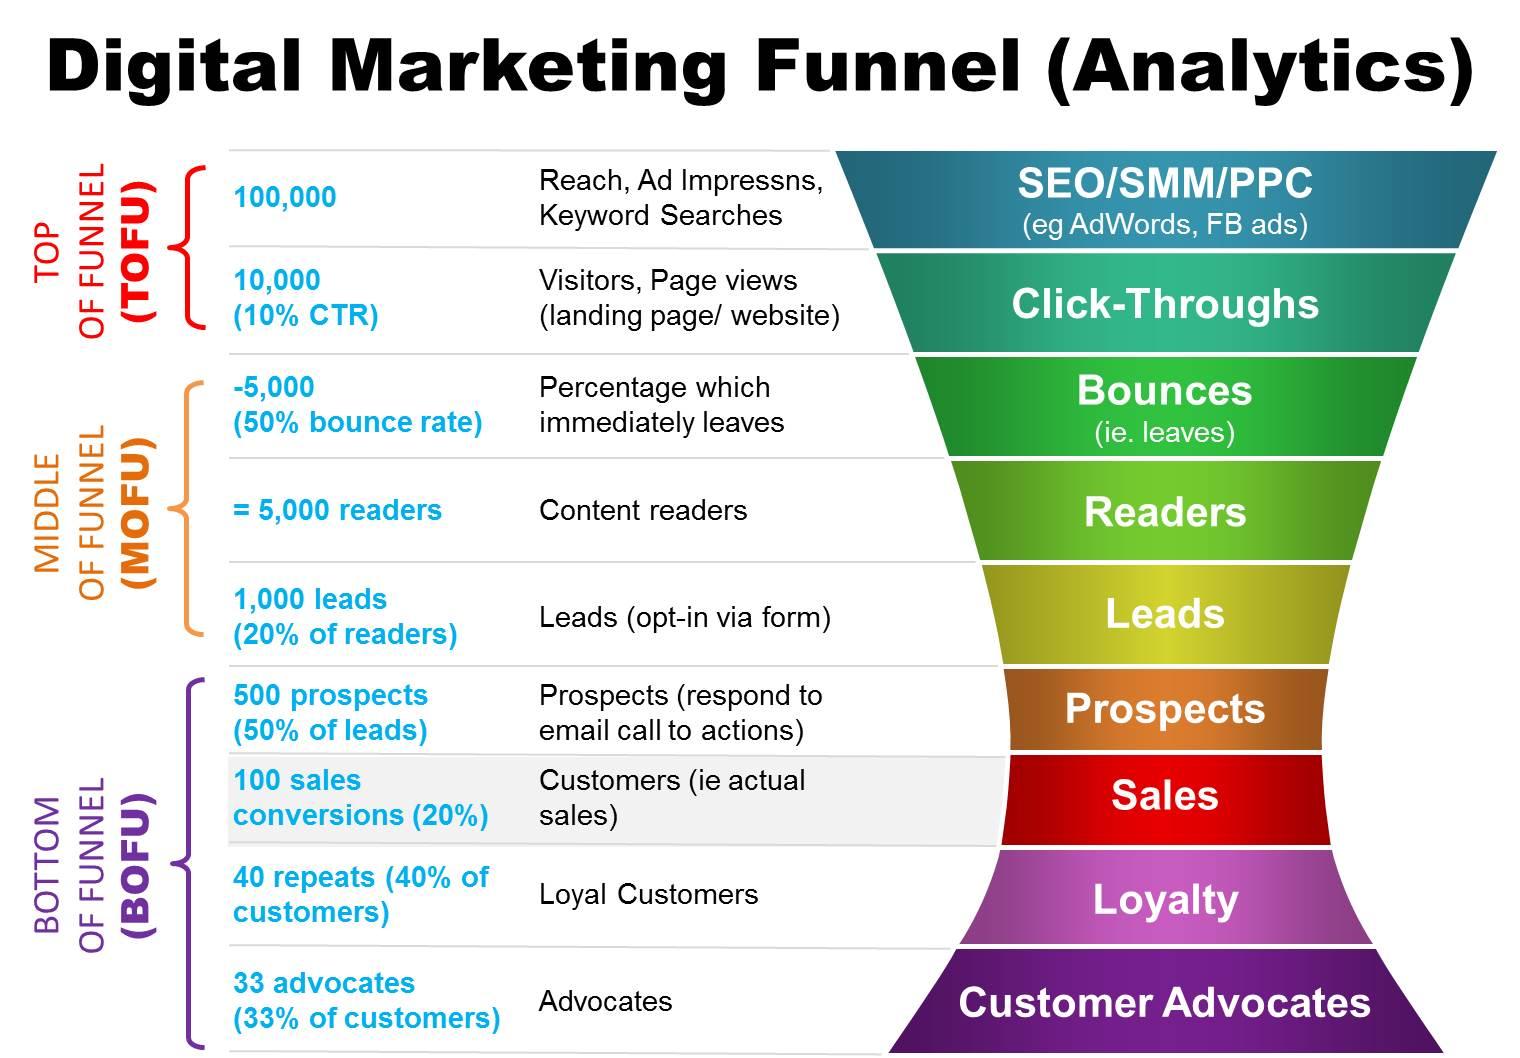 Funnel or Ecosystem Digital Marketing? - Web Design ...